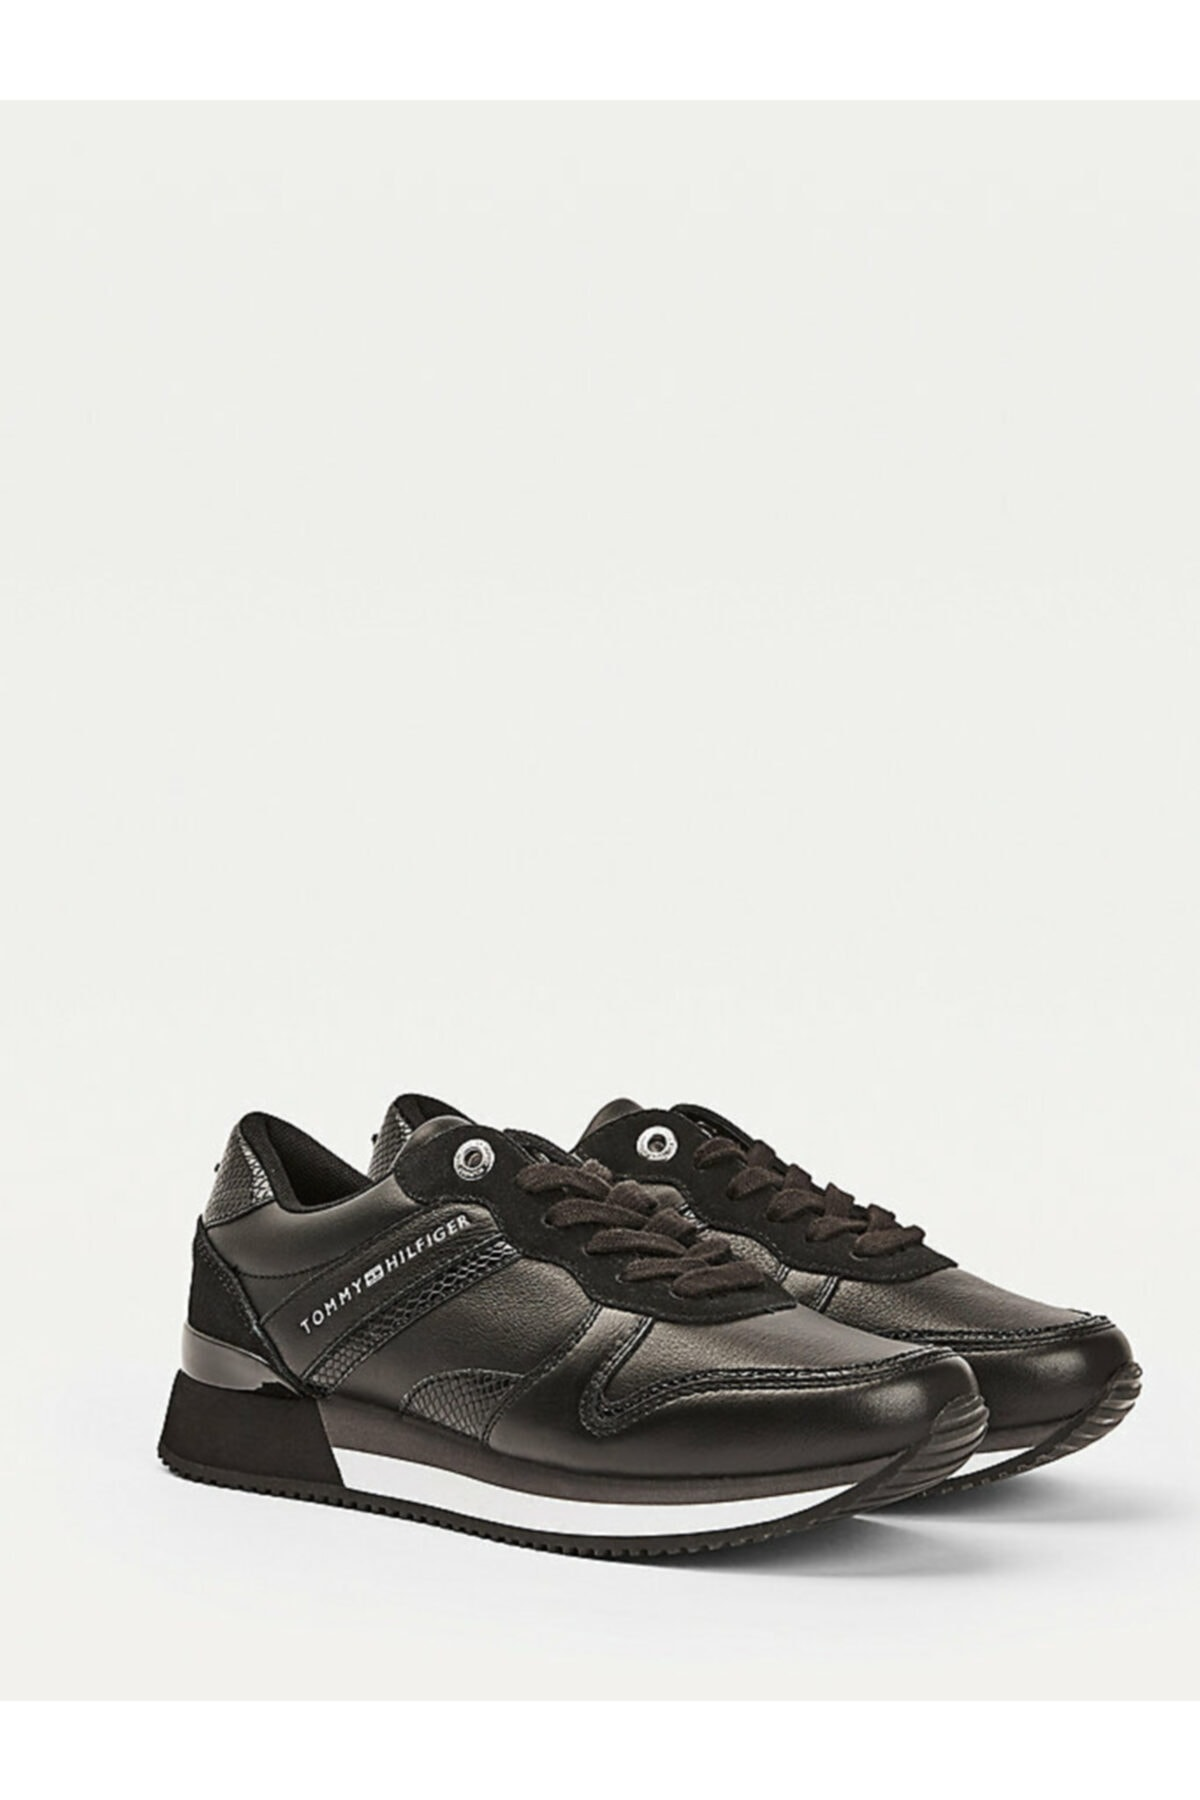 Tommy Hilfiger Kadın Siyah Sneaker Corporate Femınıne Cıty Sneaker FW0FW05233 1